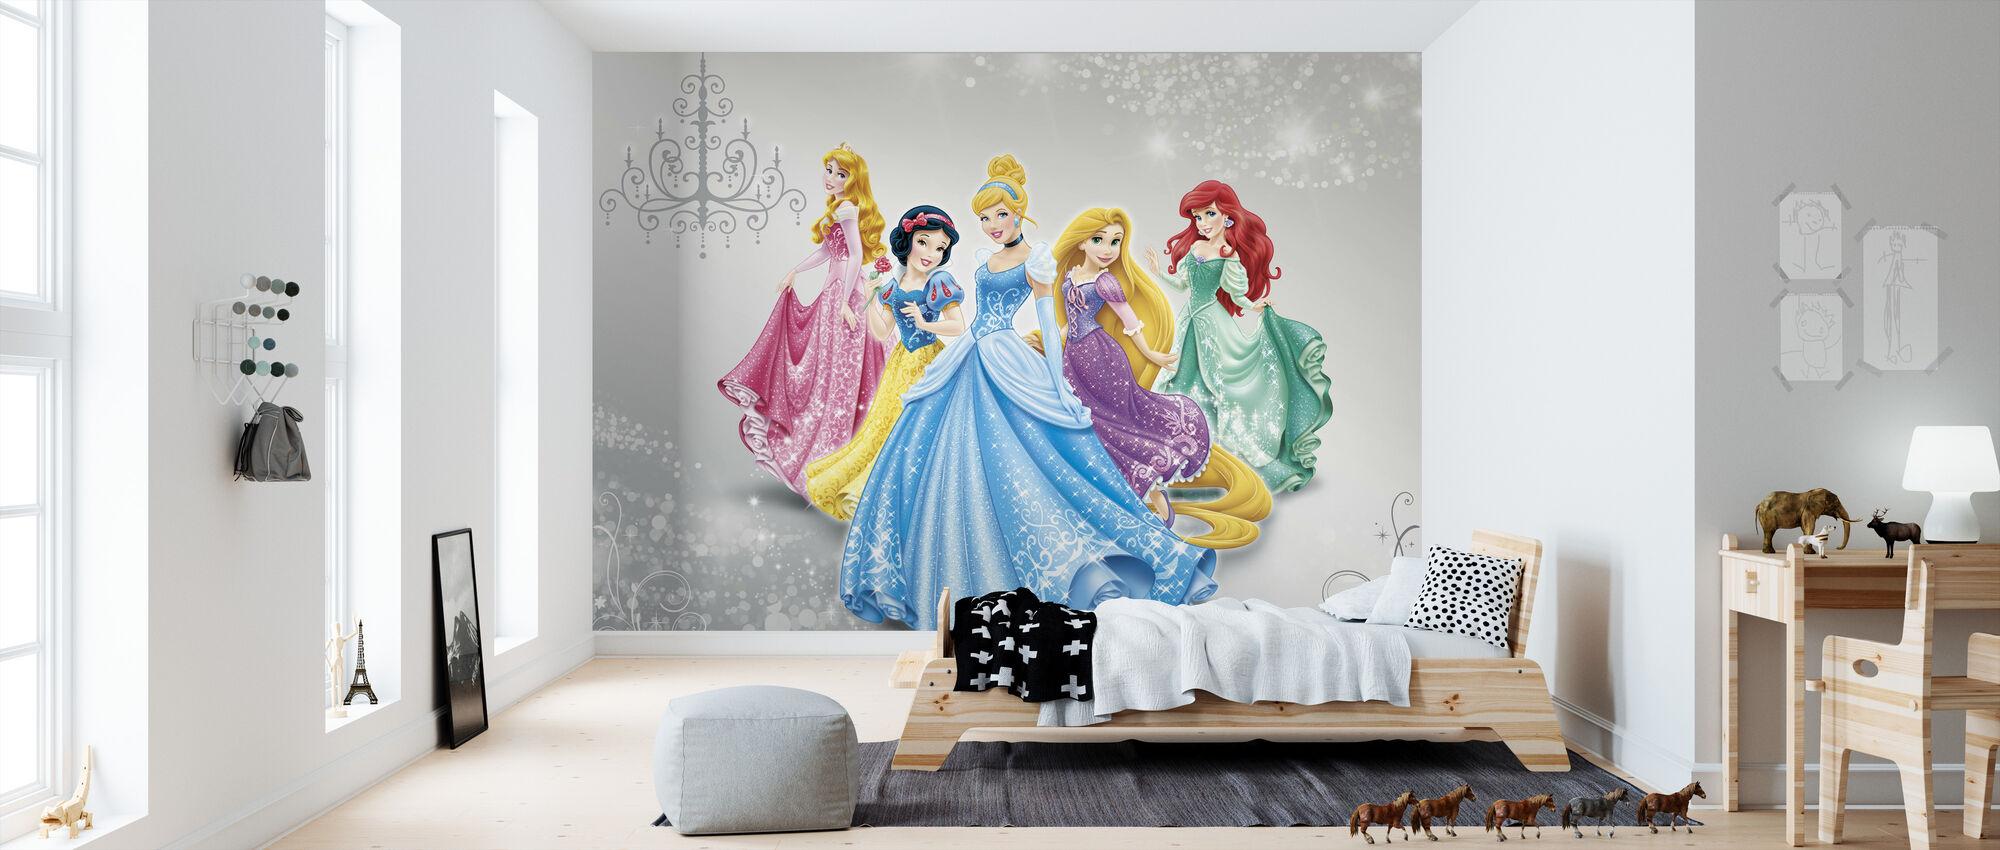 Disney prinsessa - Tapetti - Lastenhuone